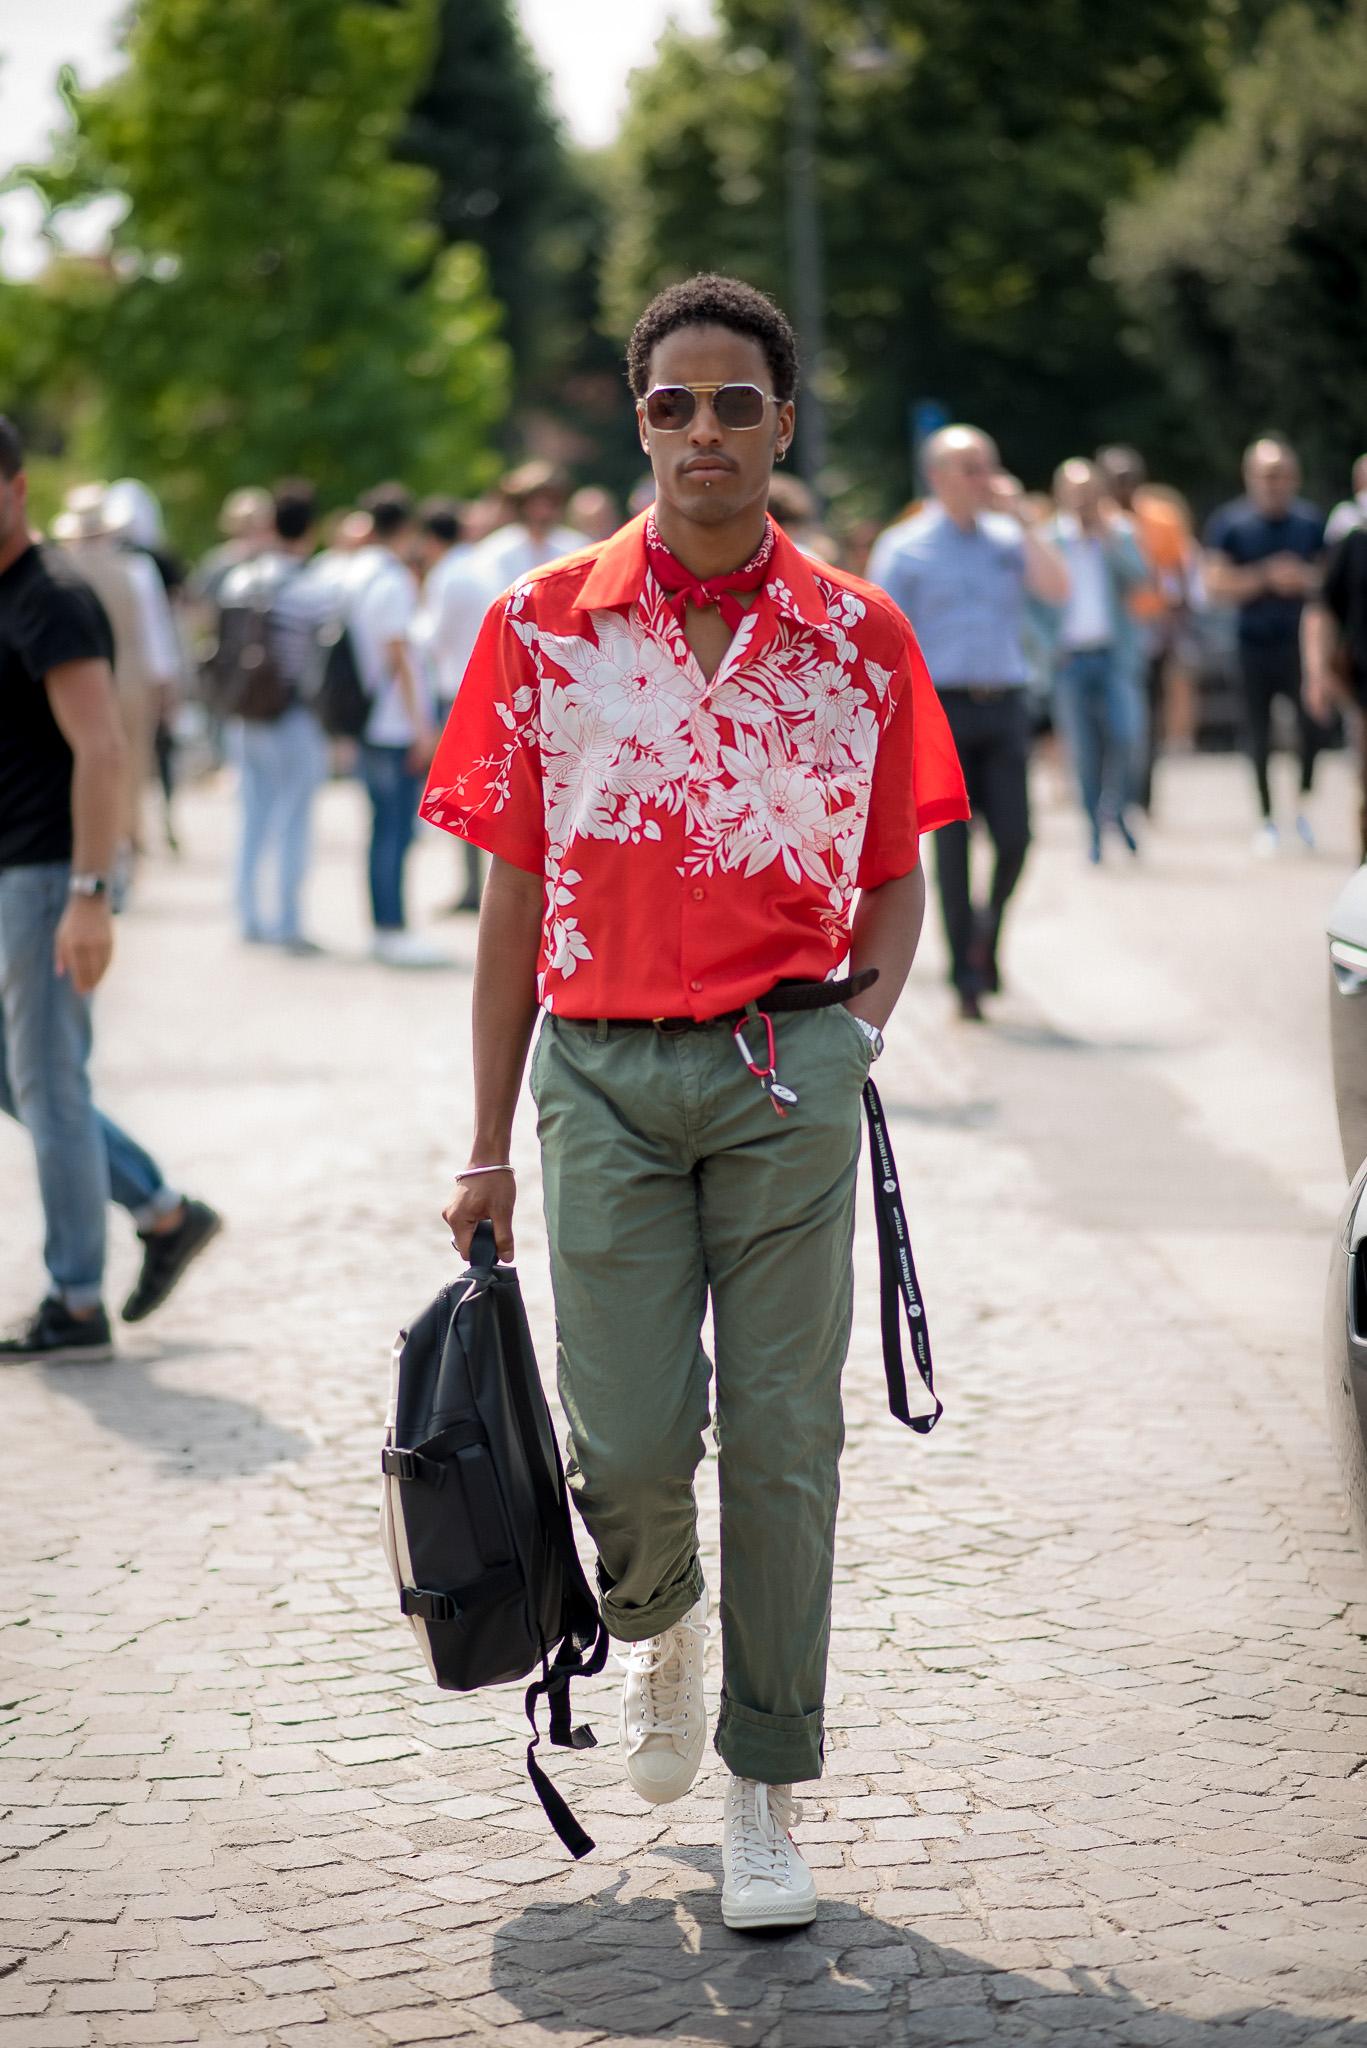 Street Style Pitti Uomo 92 Florence June 2017 Photography Annika Lagerqvist www.annikasomething.com